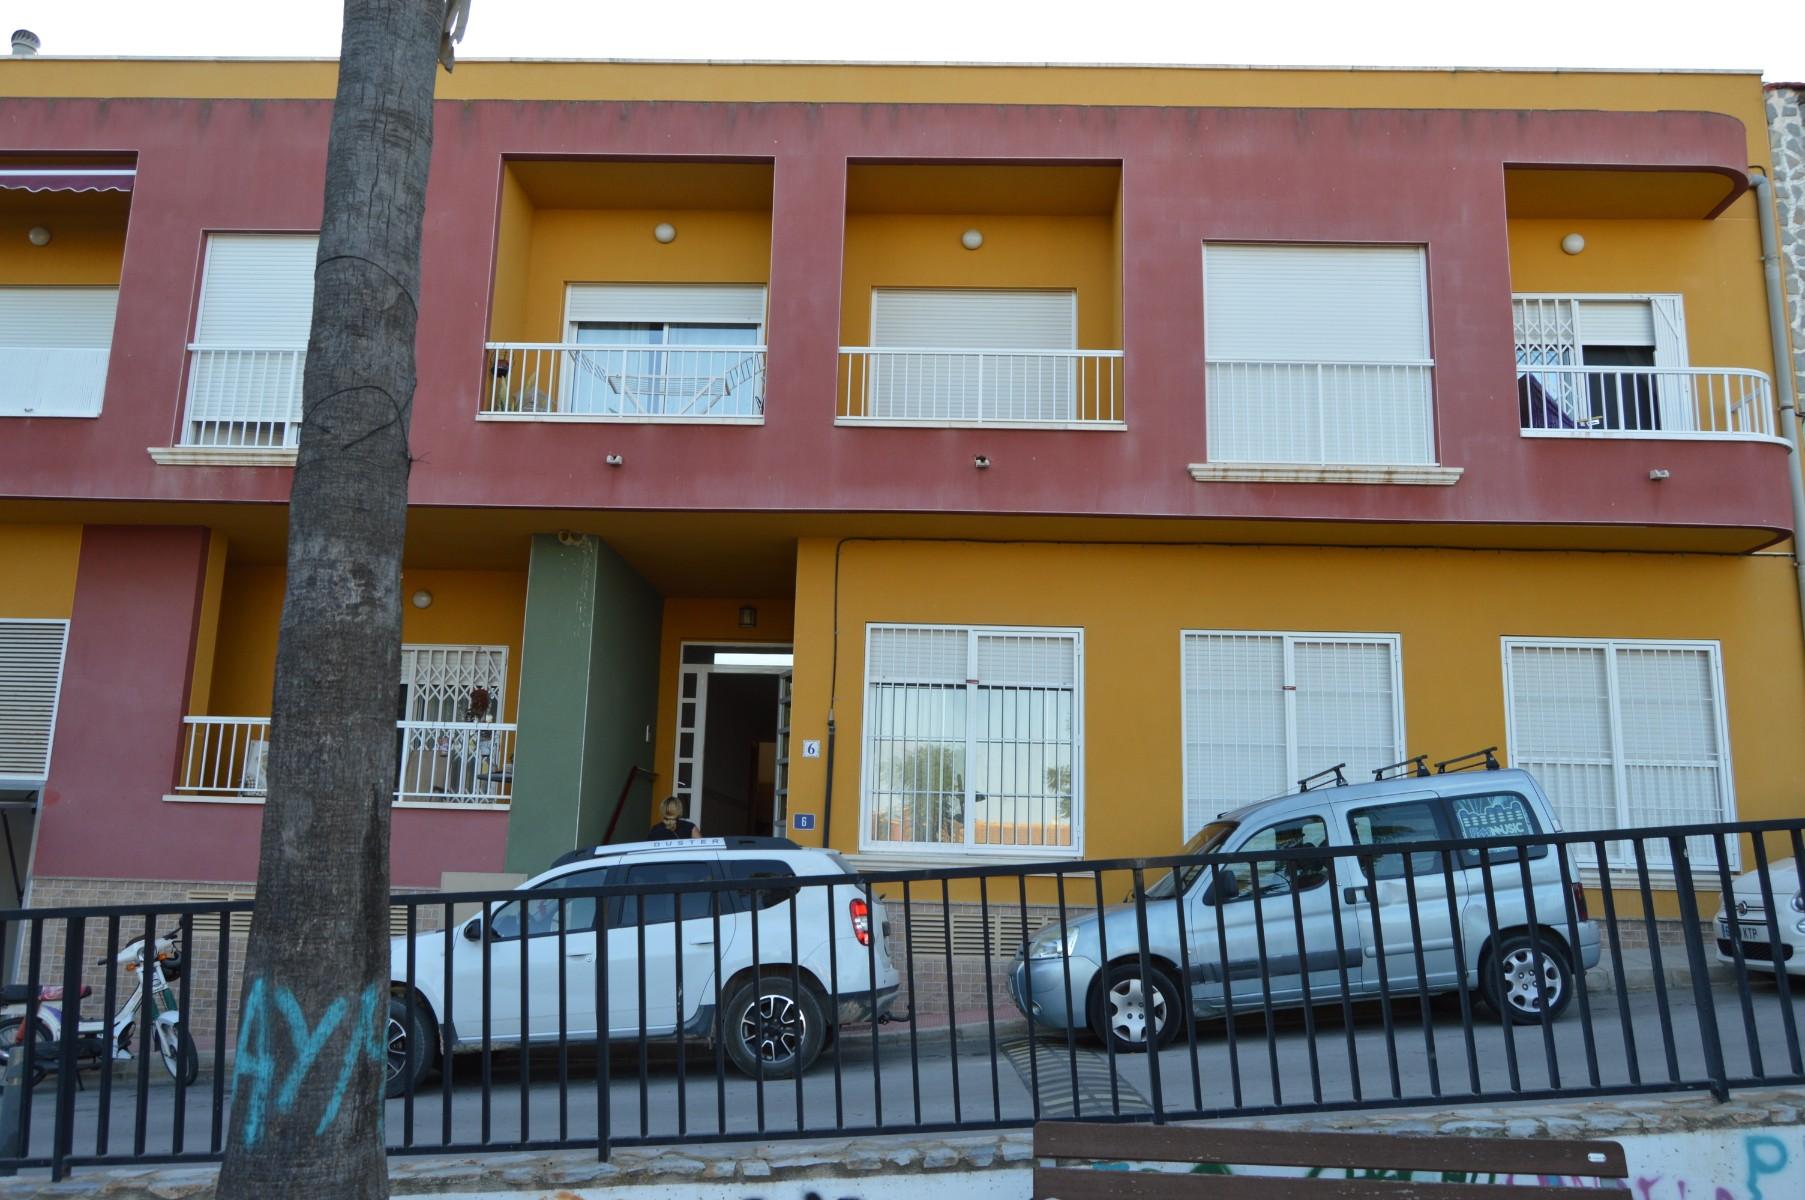 For long-term let: 3 bedroom apartment / flat in Torremendo